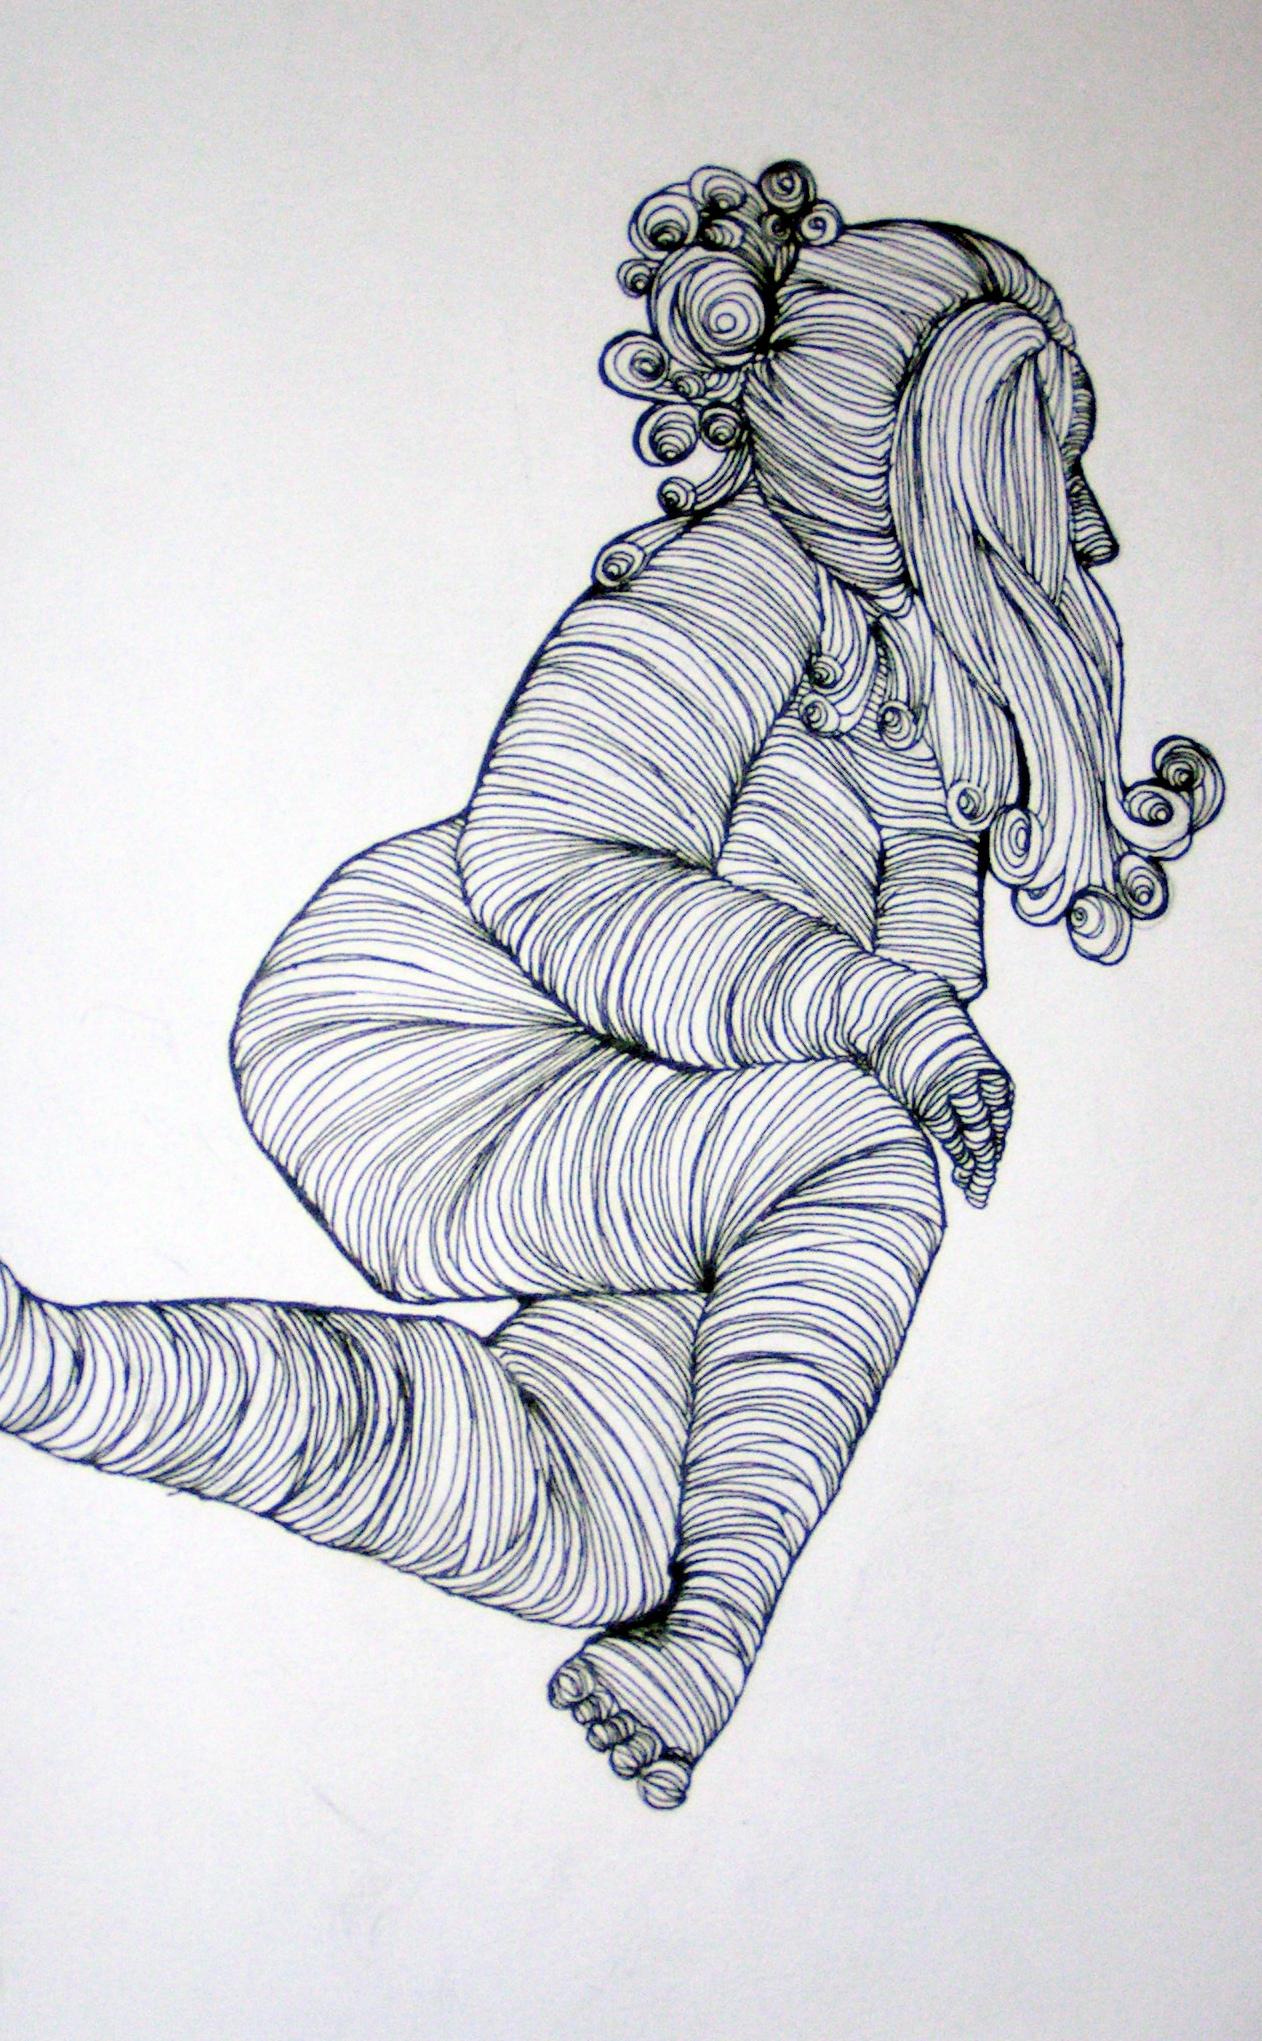 Contour Line Drawing Person : Cross contour by scalenetristy on deviantart